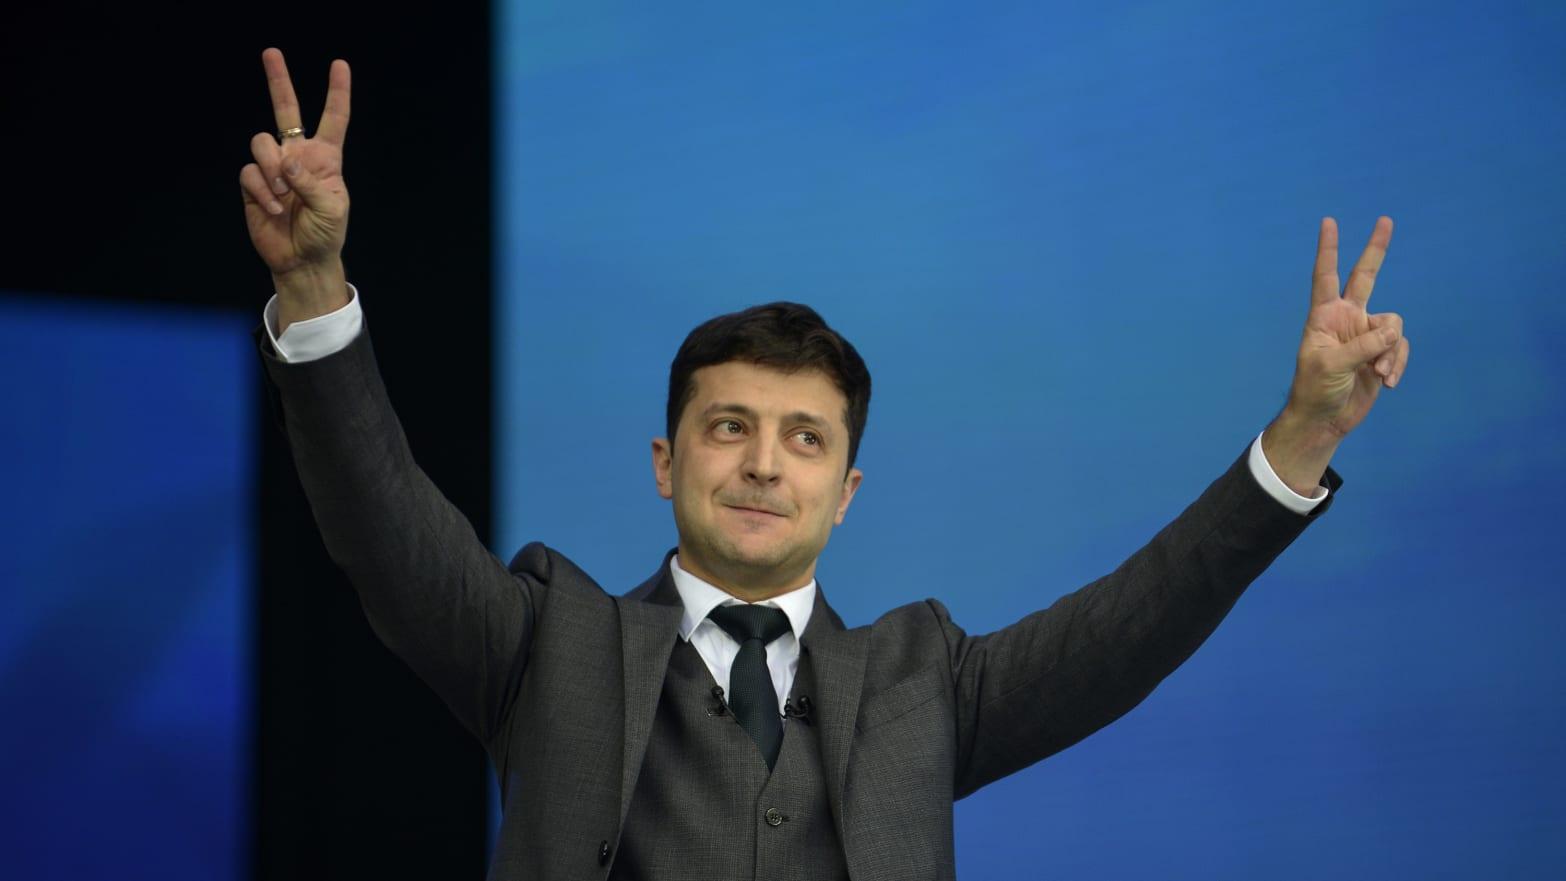 Can Ukraine's Comedian President Volodomyr Zelensky Seriously Shake Things Up?